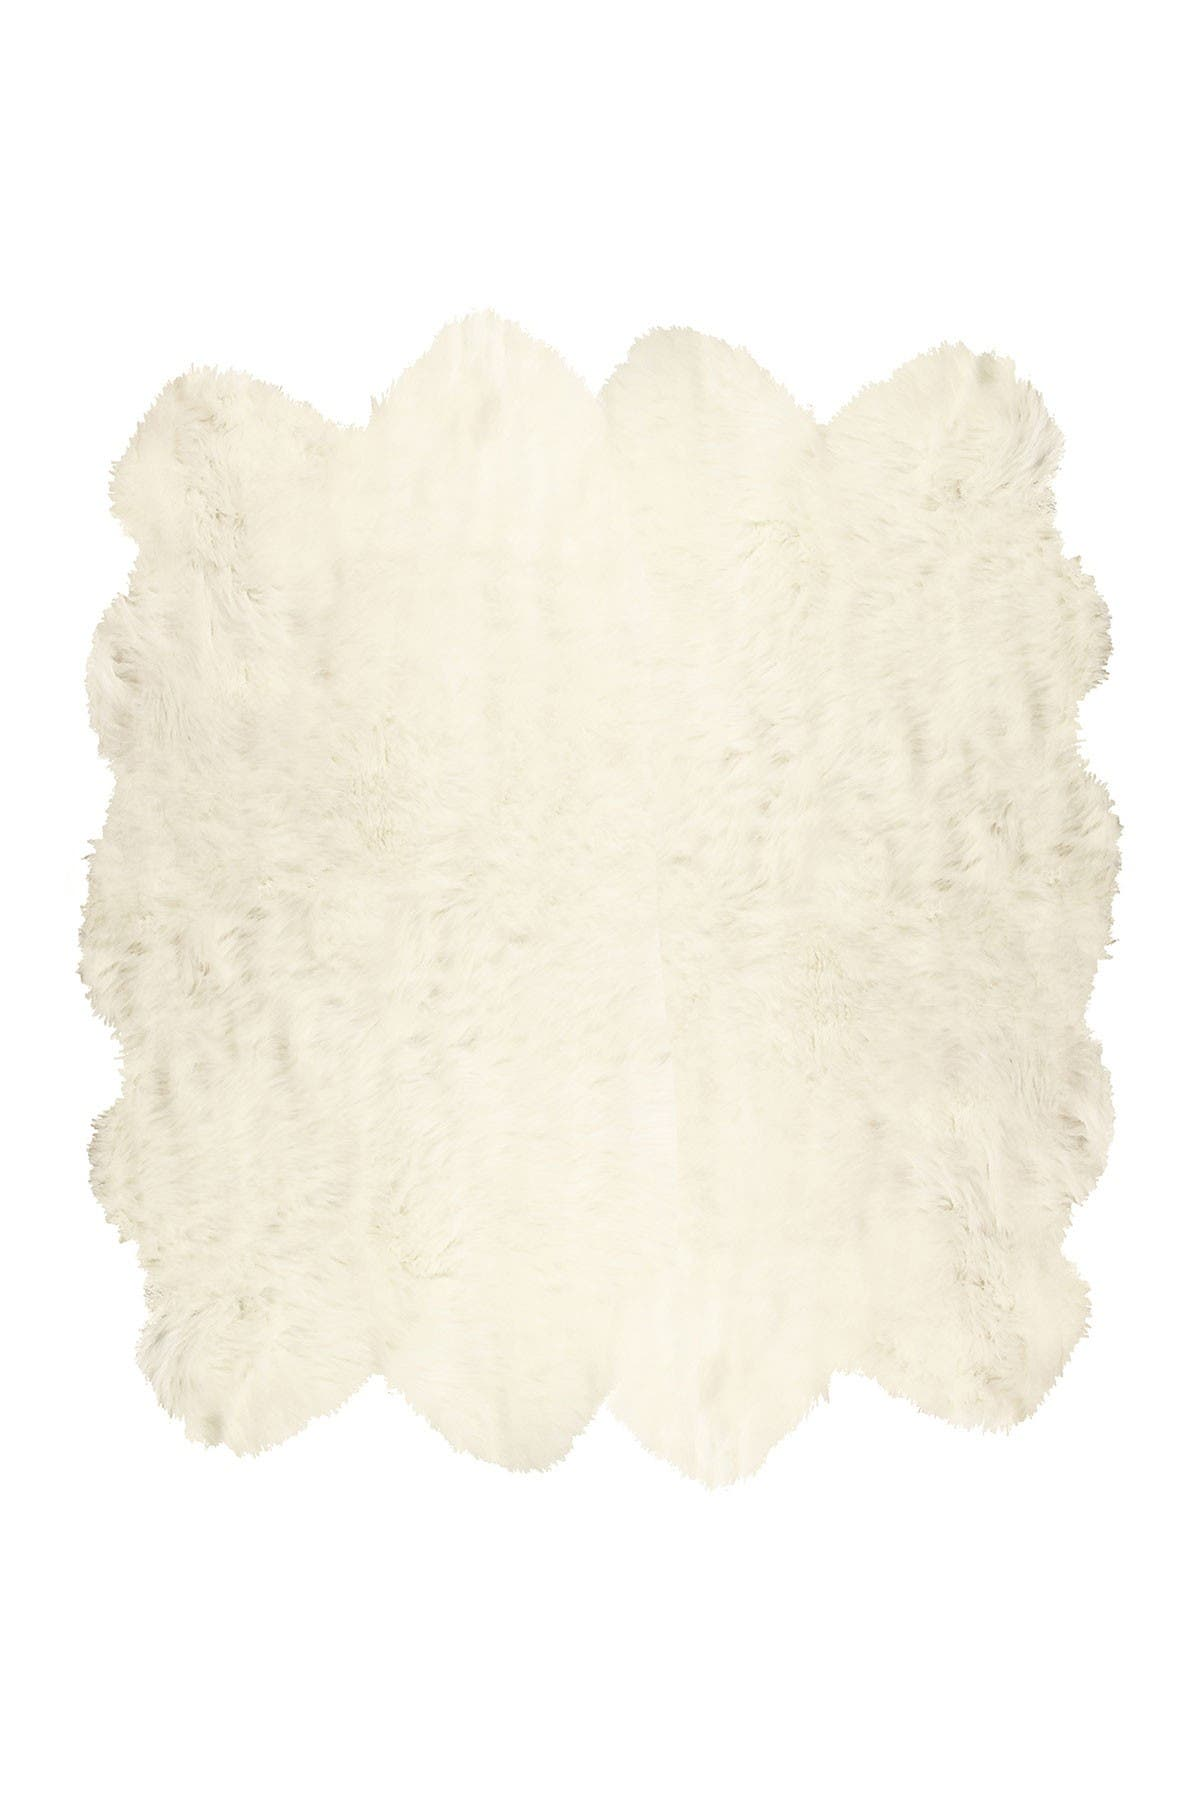 Image of LUXE Gordon Faux Sheepskin Rug - Off White